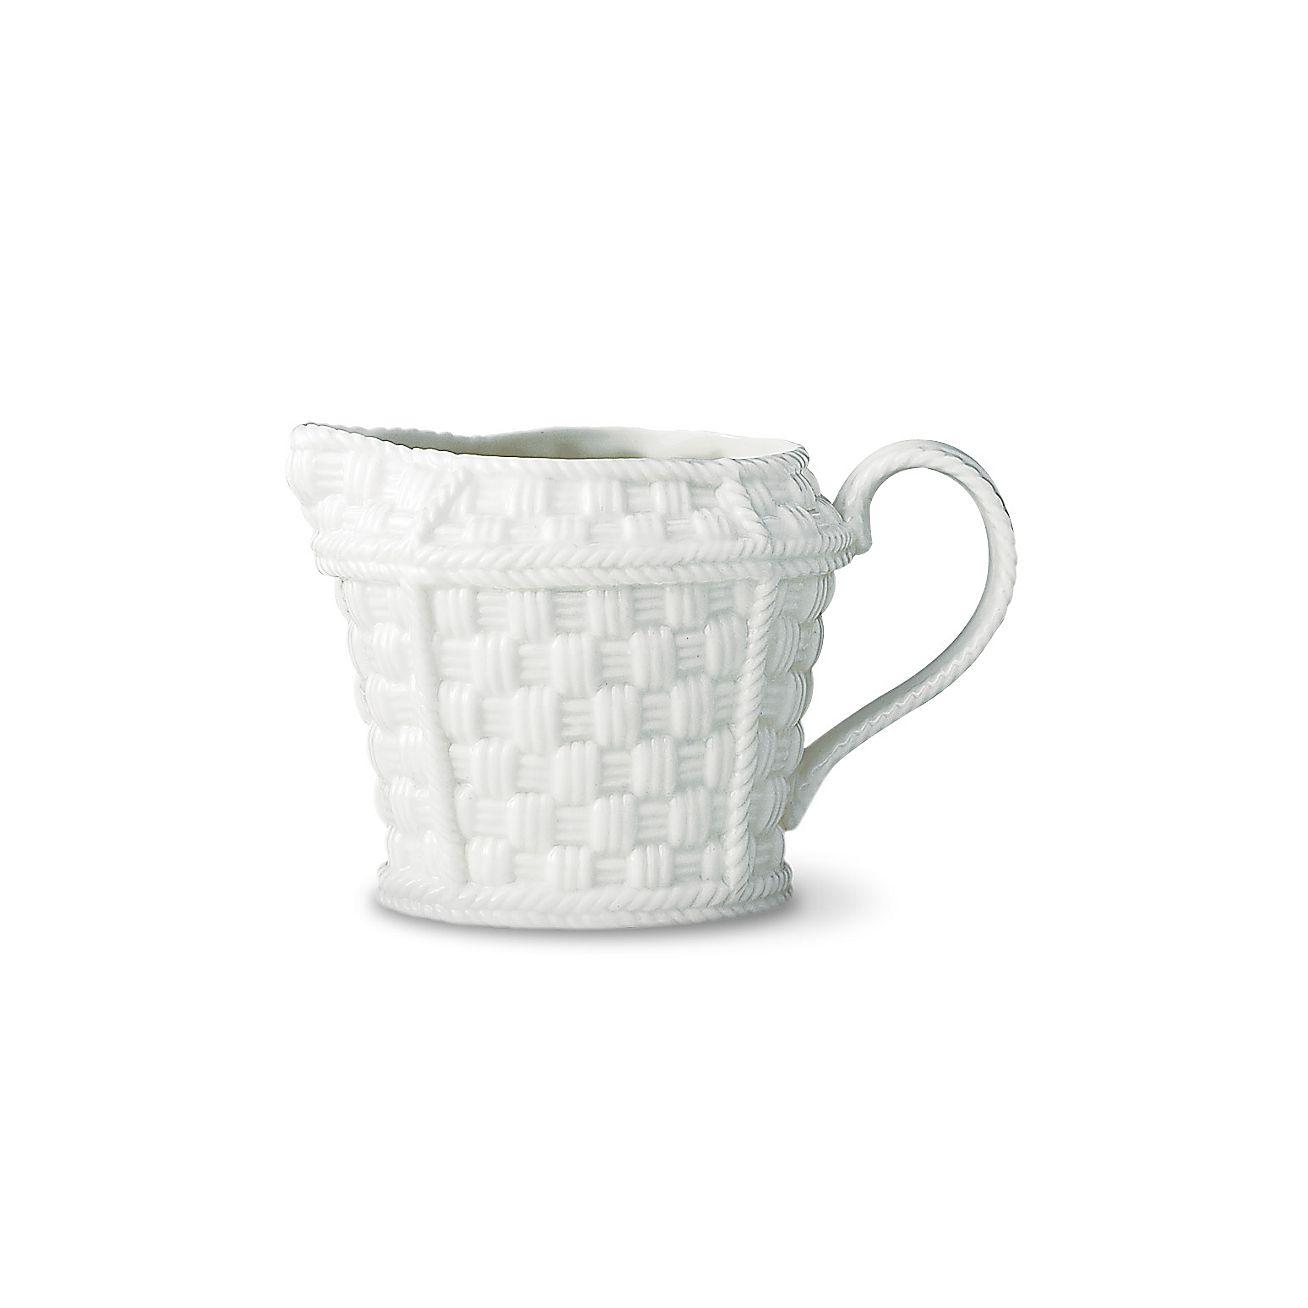 Tiffany Weave:Creamer